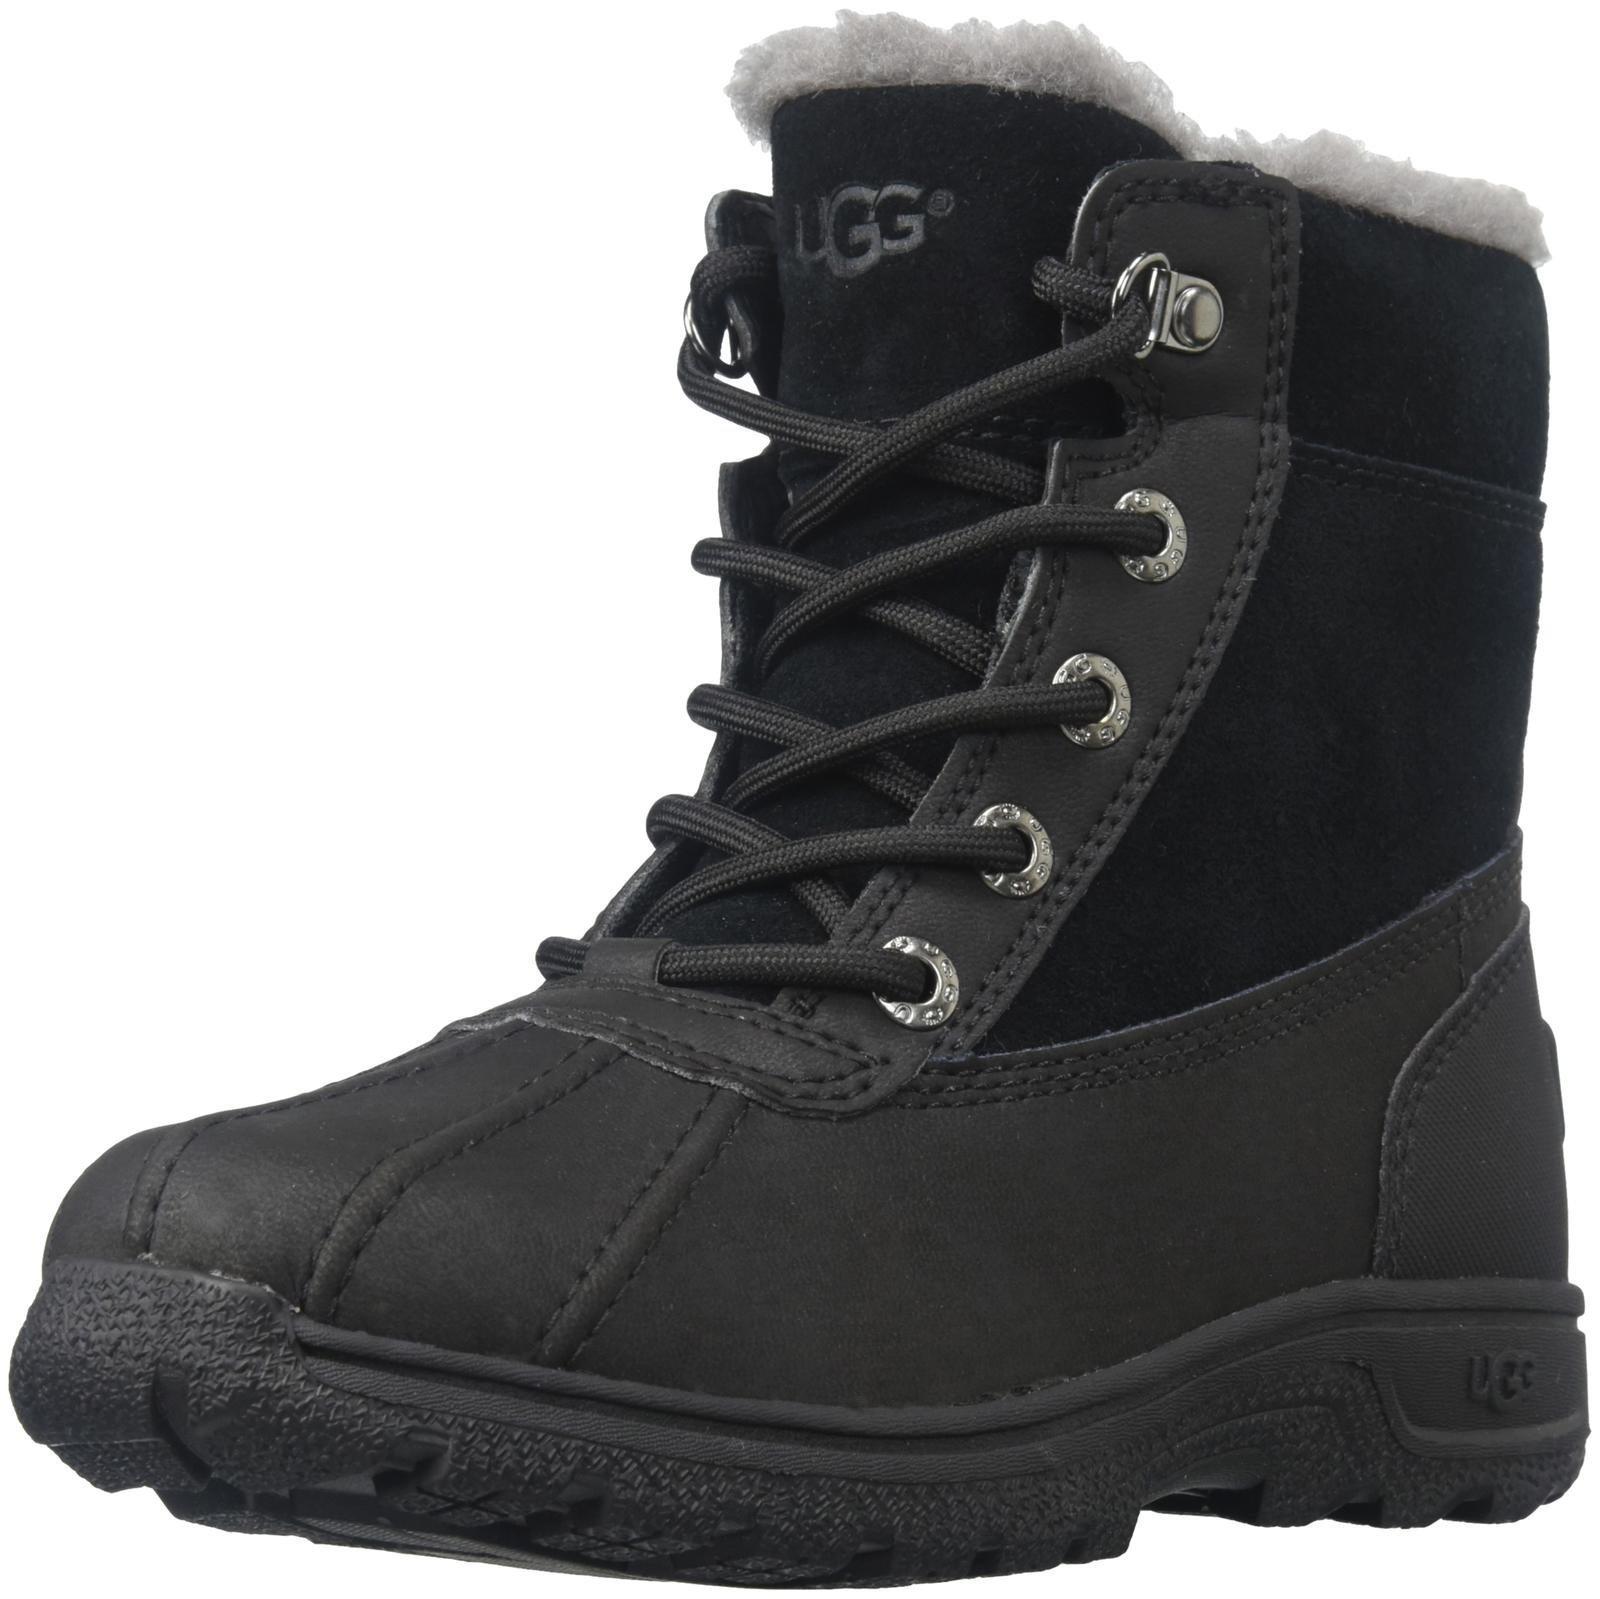 UGG Kids K Leggero Lace-up Boot, Black, 3 M US Little Kid